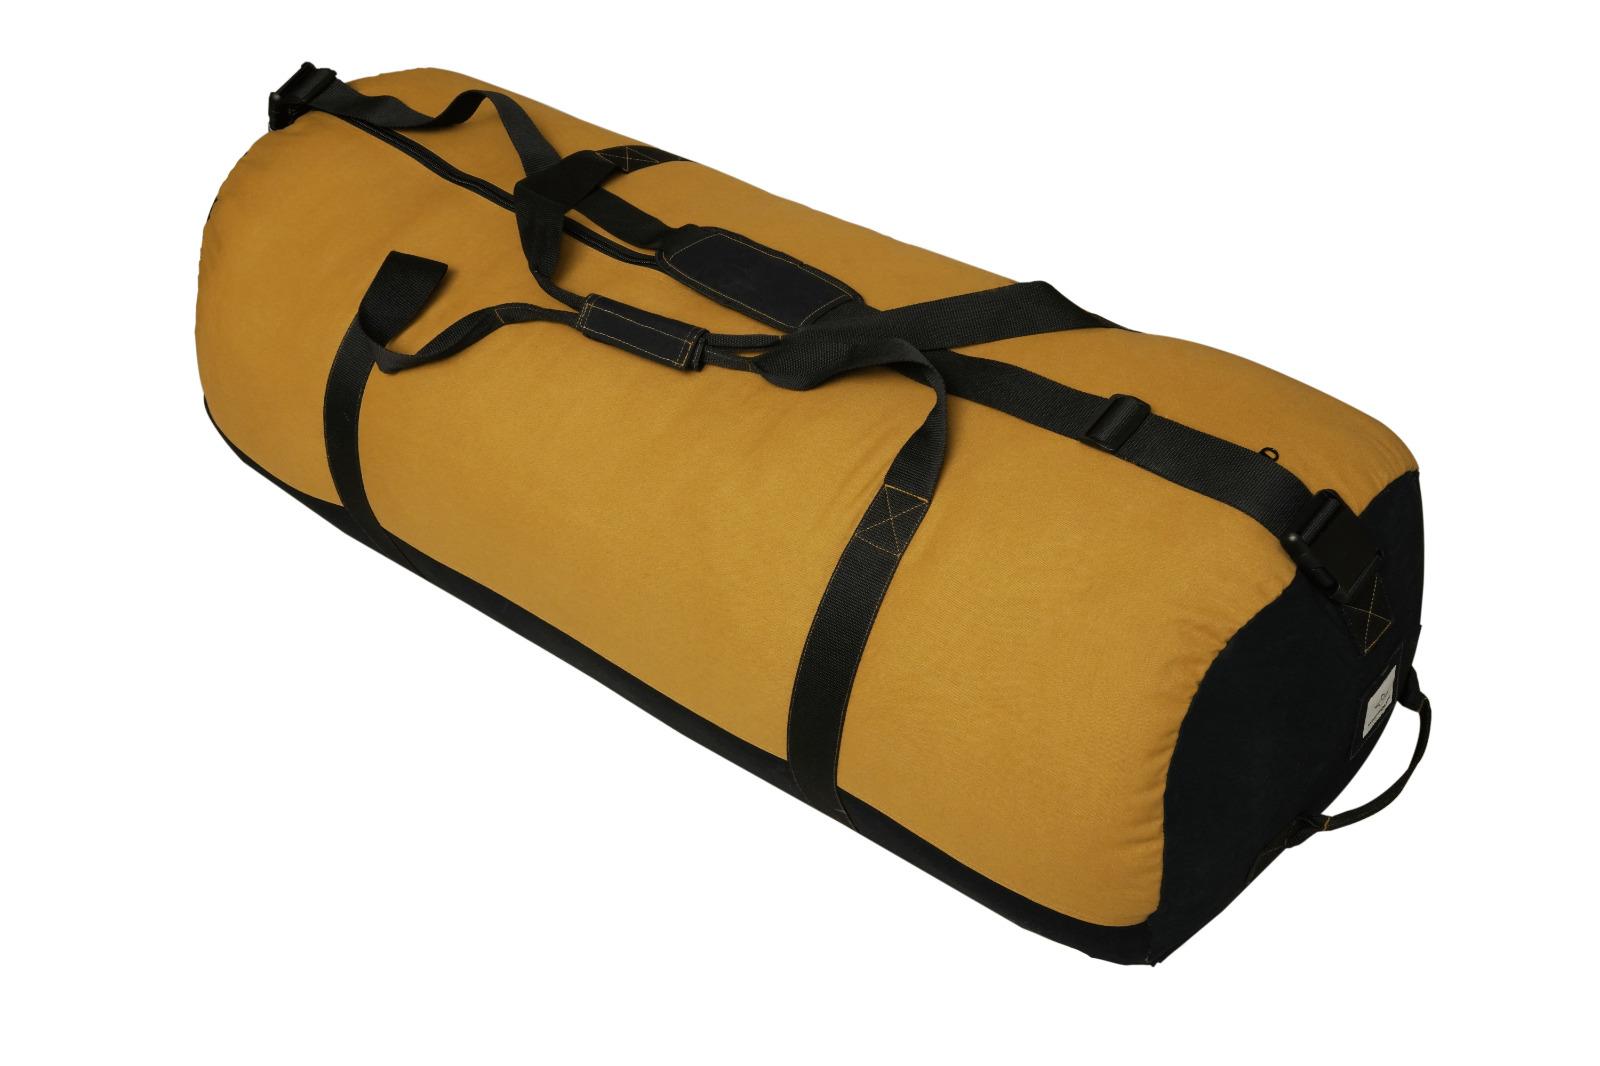 FILIOS Duffle Bag | Heavy Duty Canvas Duffel Bag Multipurpose, Travel & Outdoors